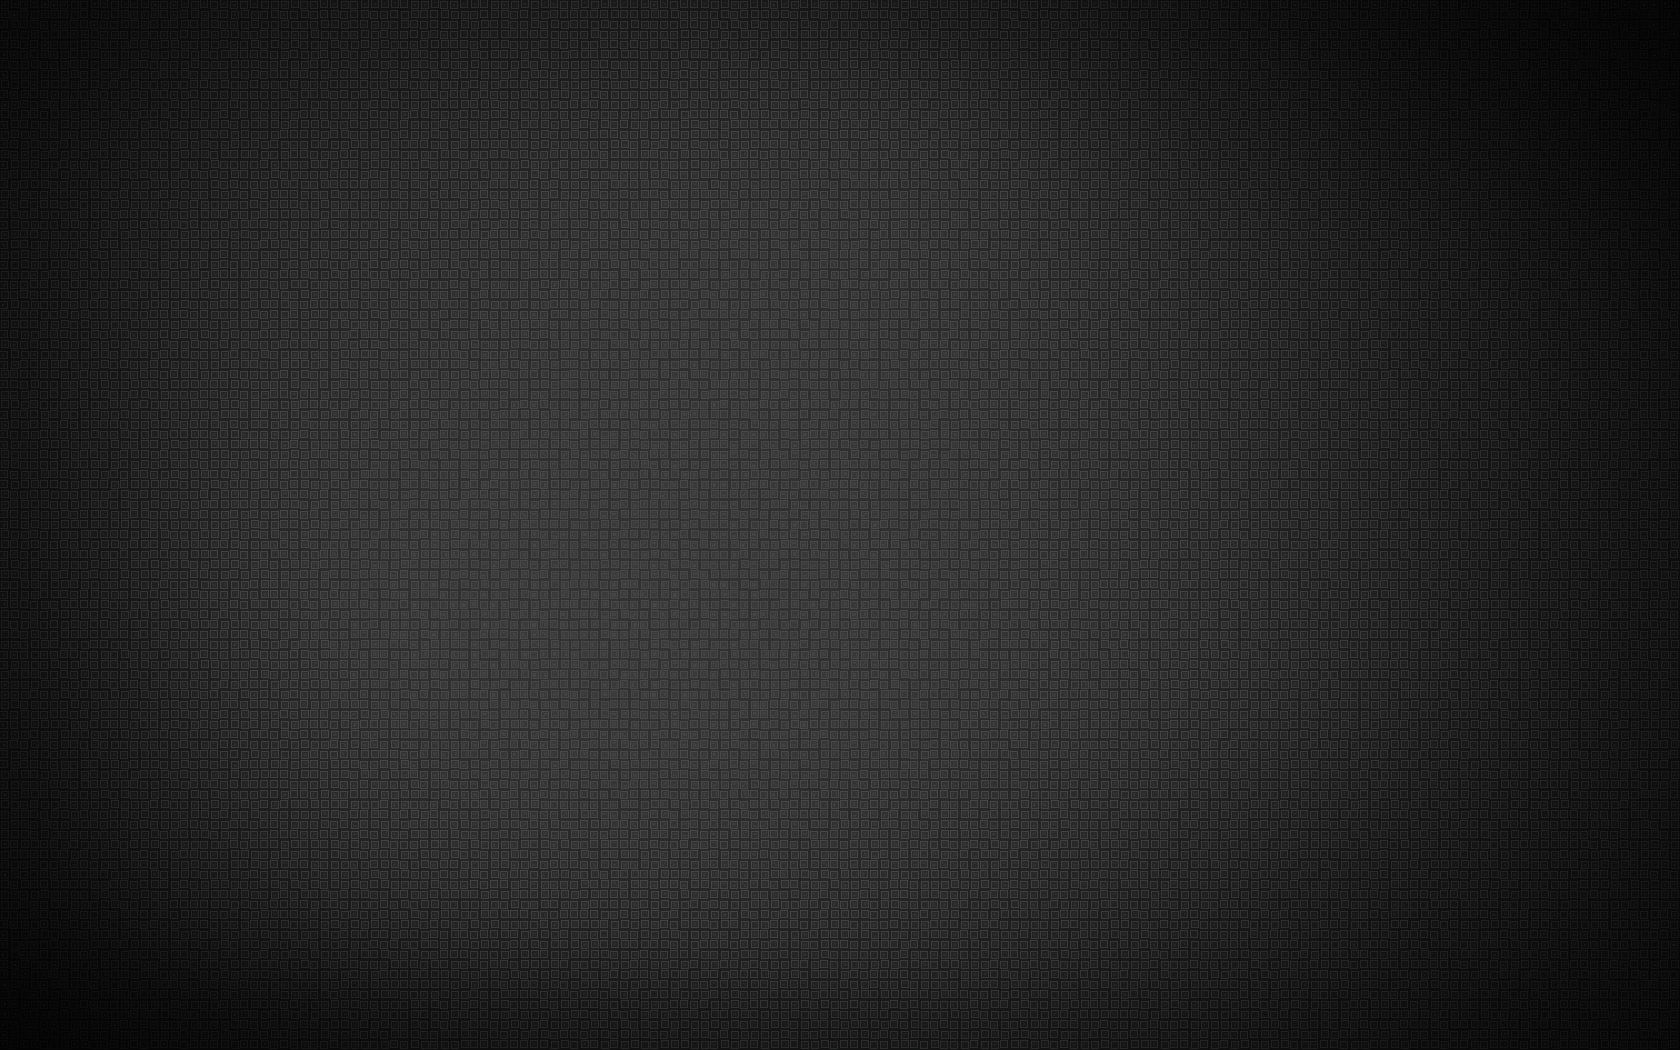 16 Luxury Pubg Wallpaper Iphone 6: Simple Desktop Backgrounds